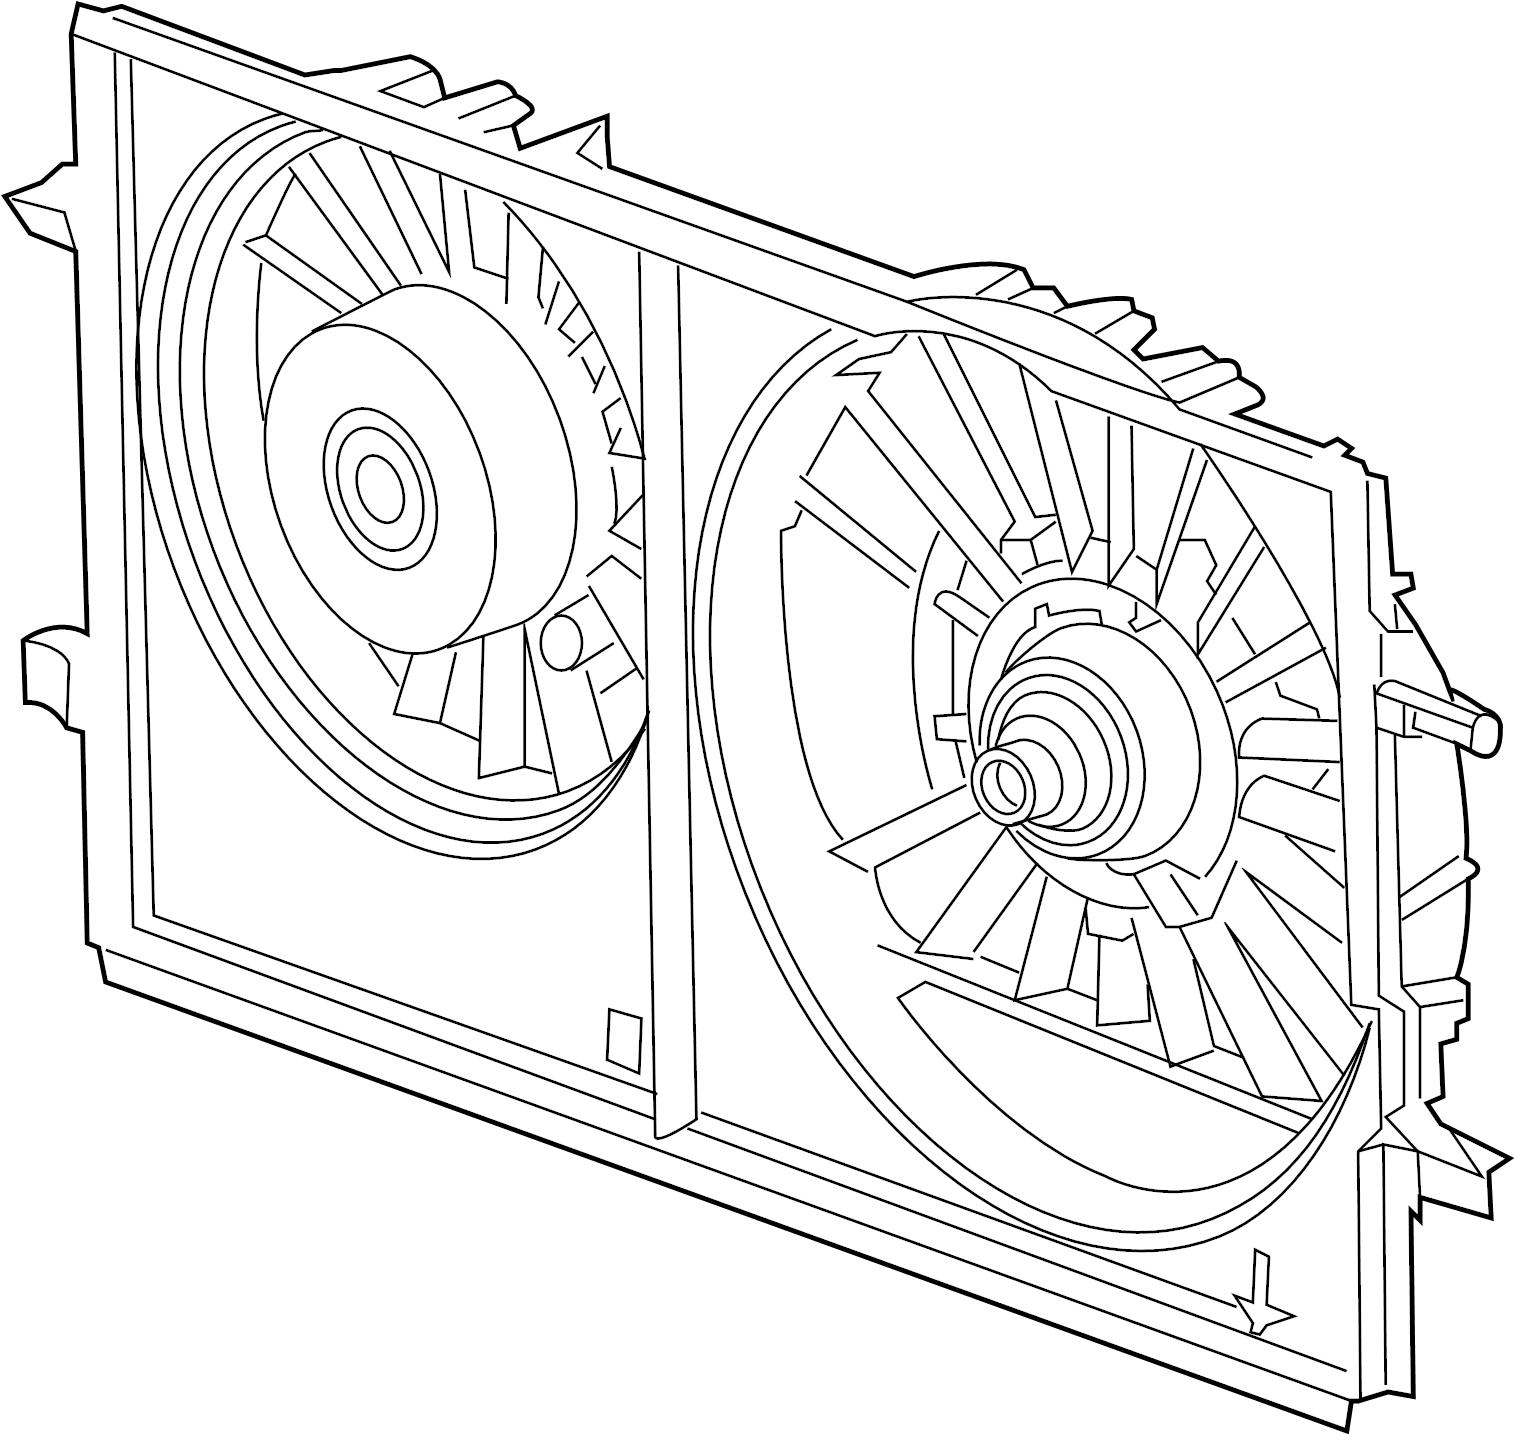 Pontiac G6 Engine Cooling Fan Assembly. LITER, RADIATOR